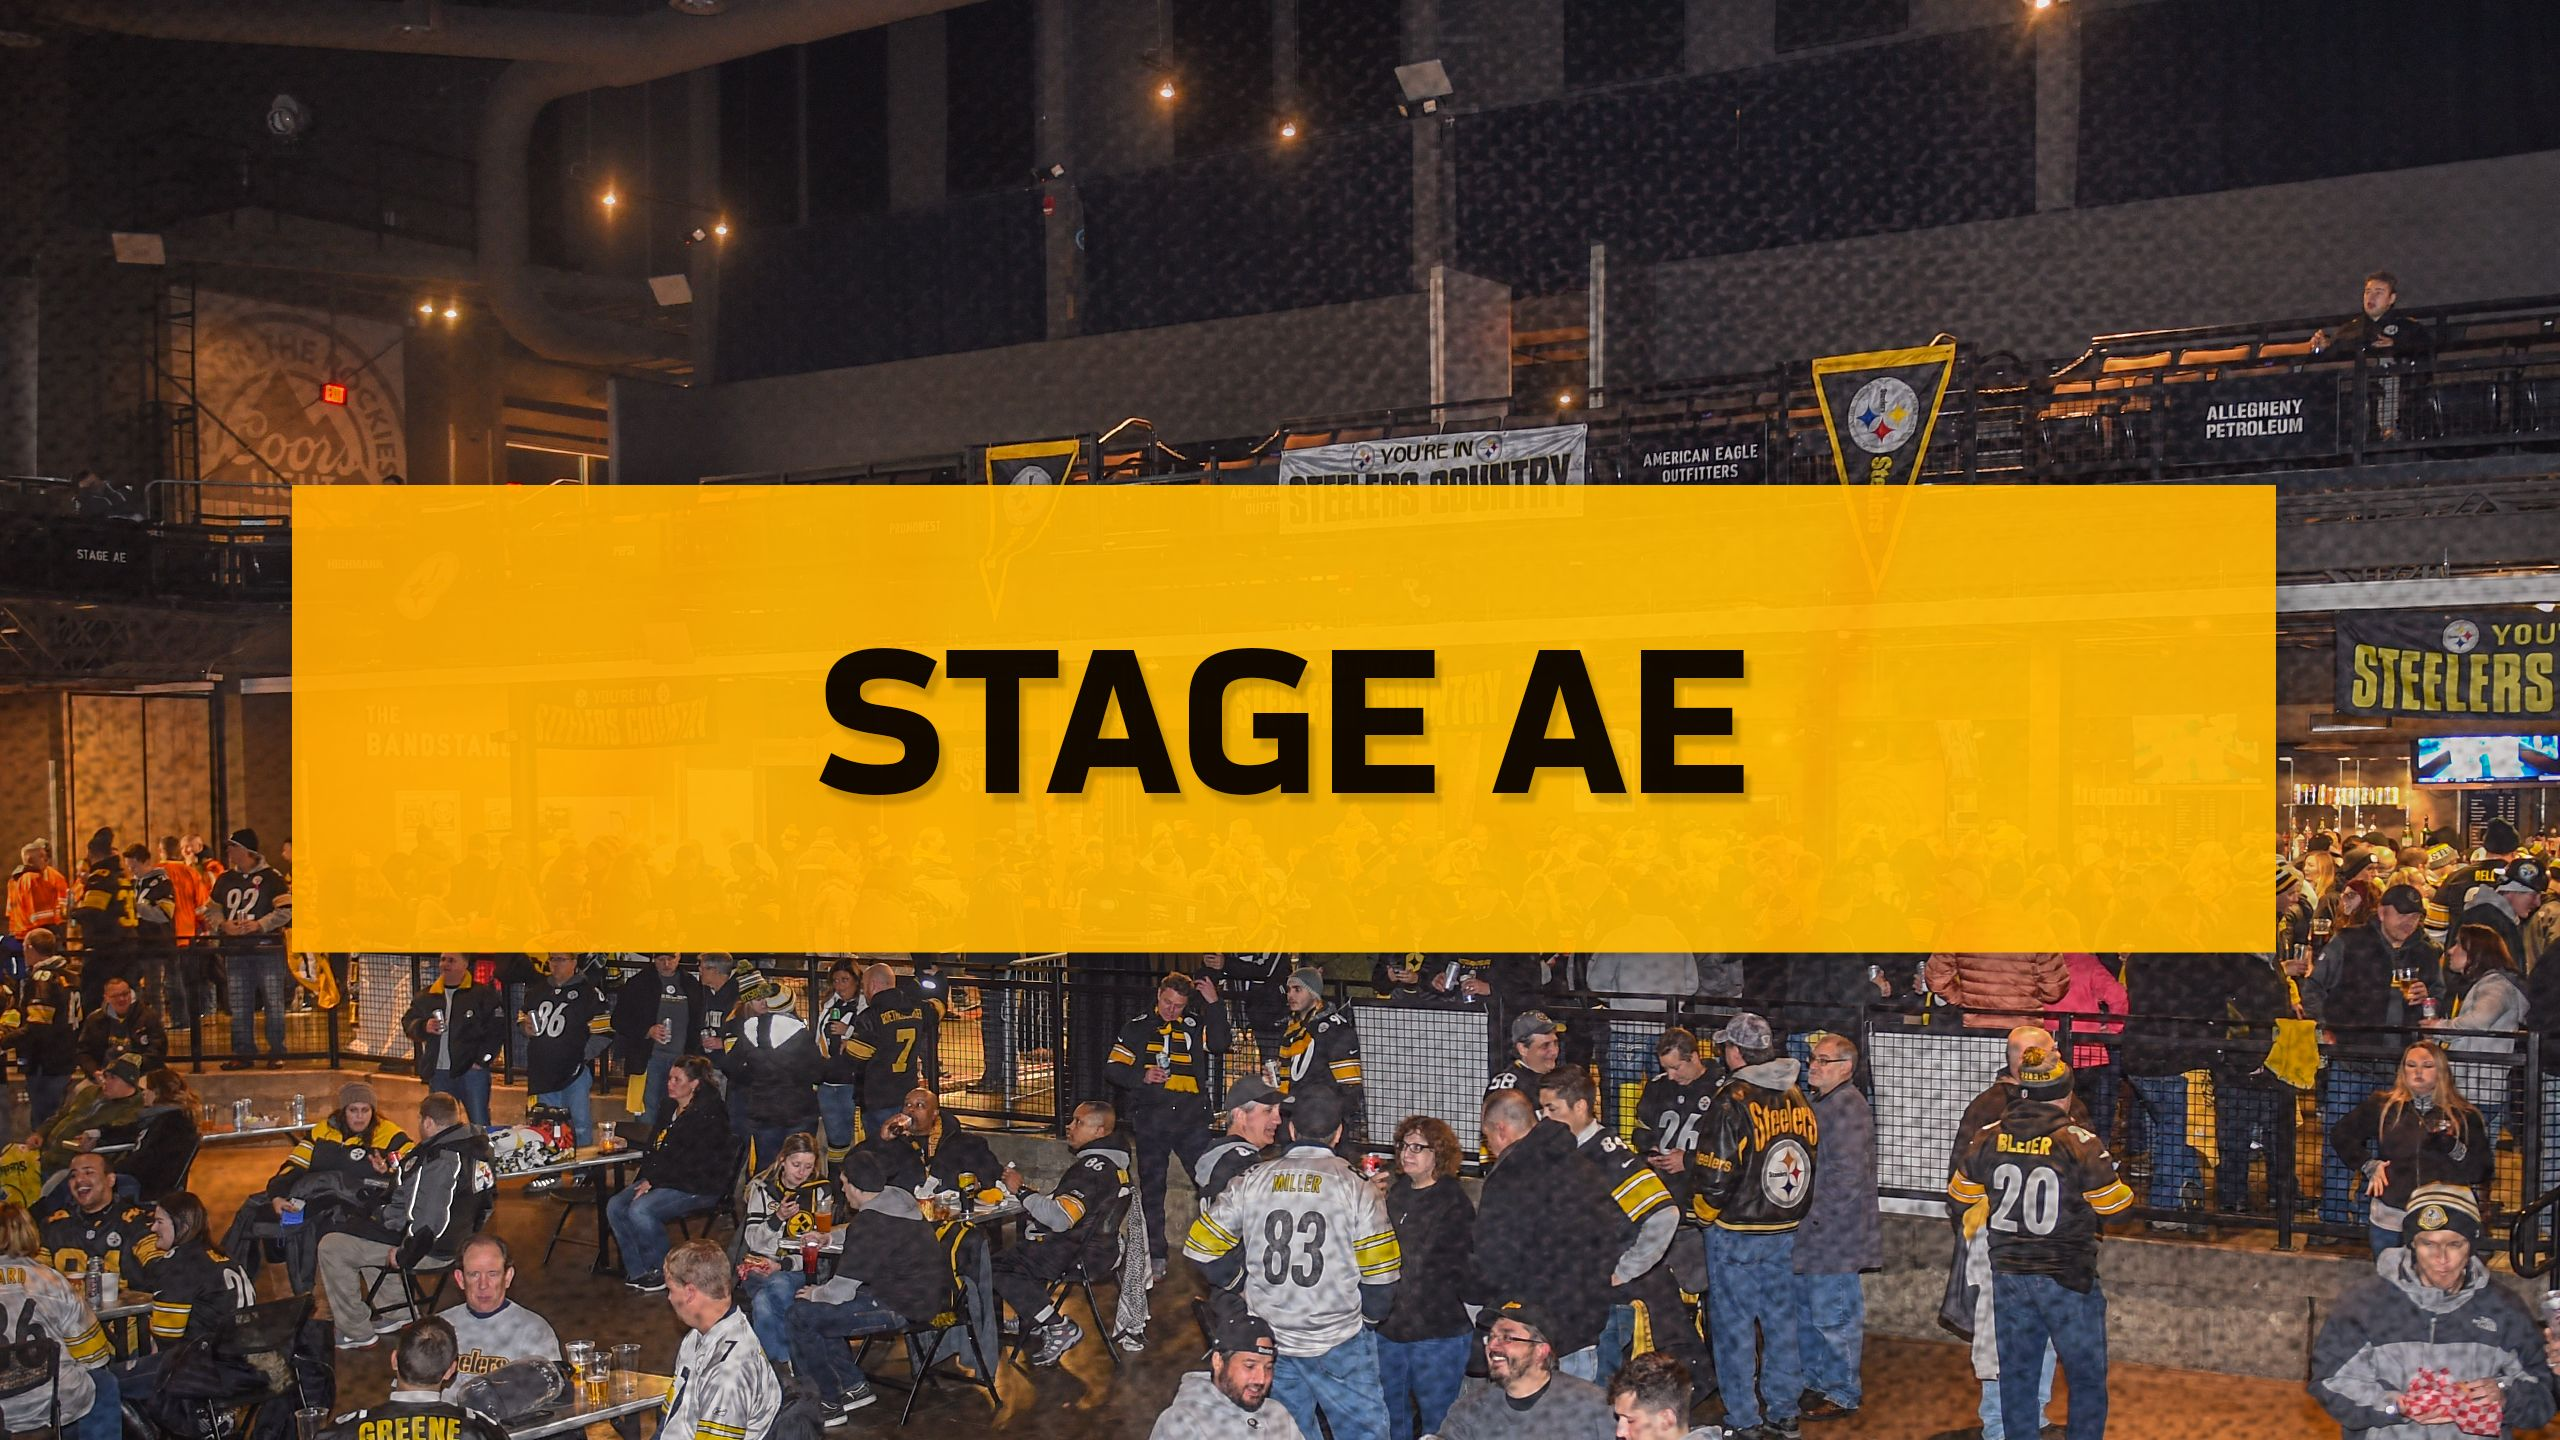 StageAE